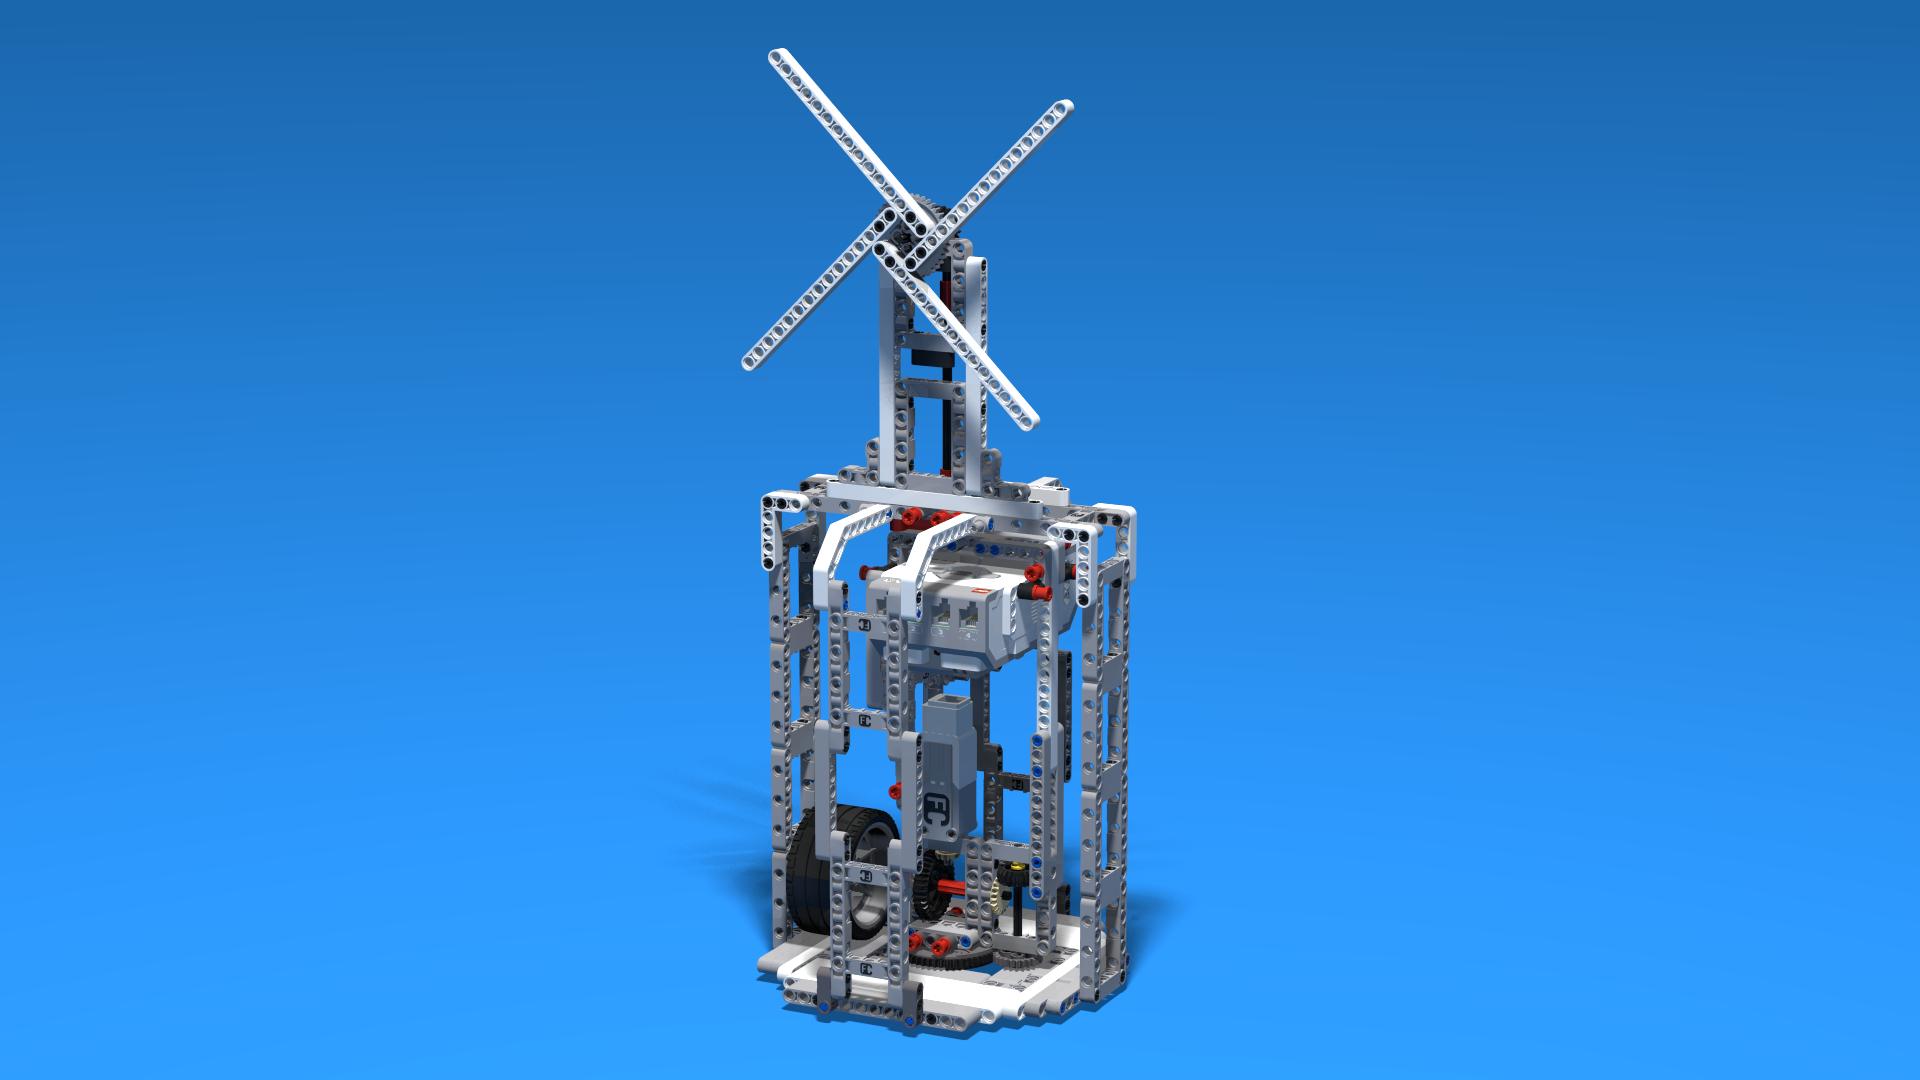 lego mindstorms robot instructions